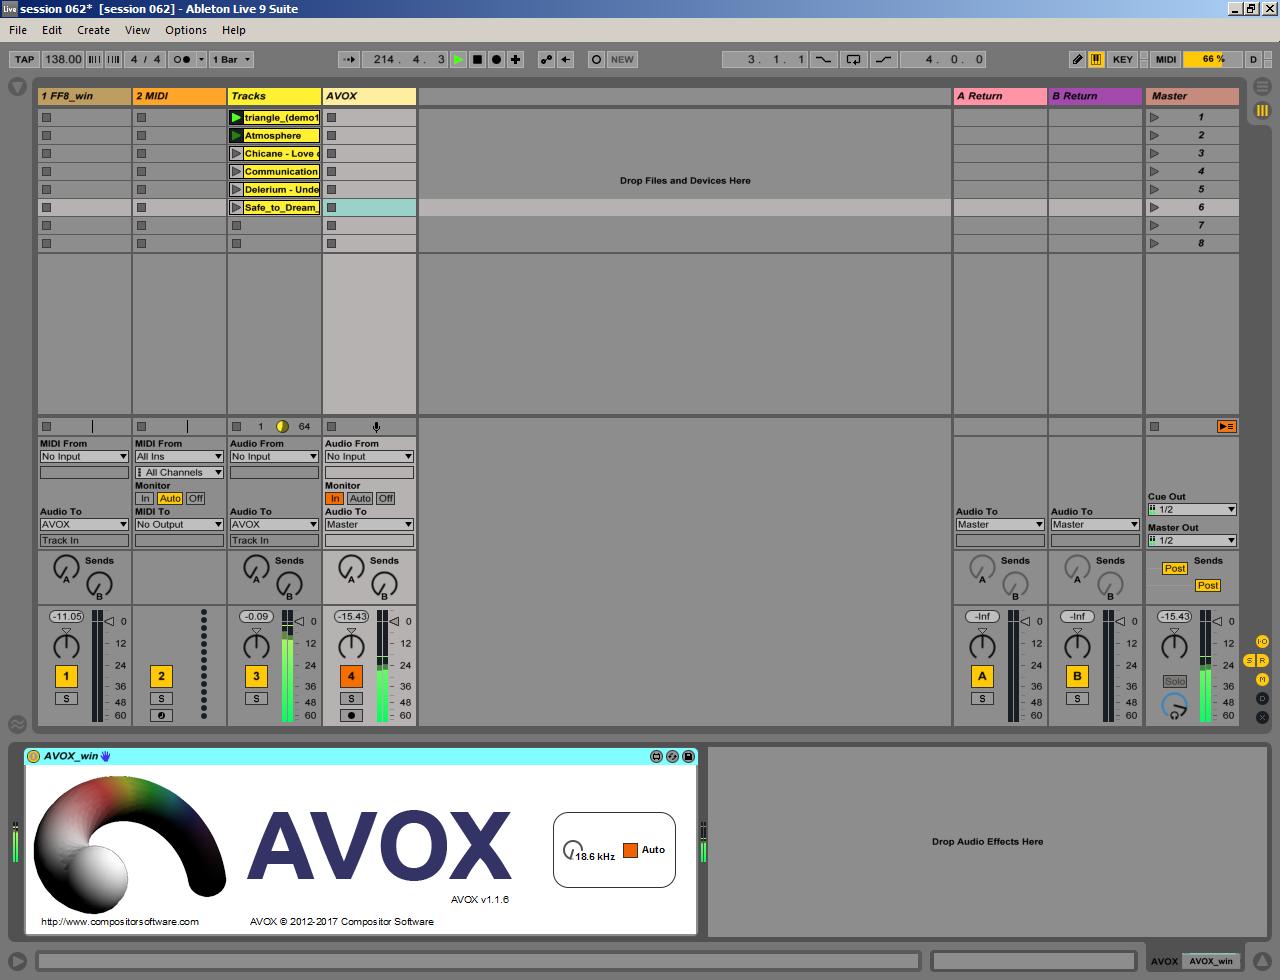 AVOX Max for Live